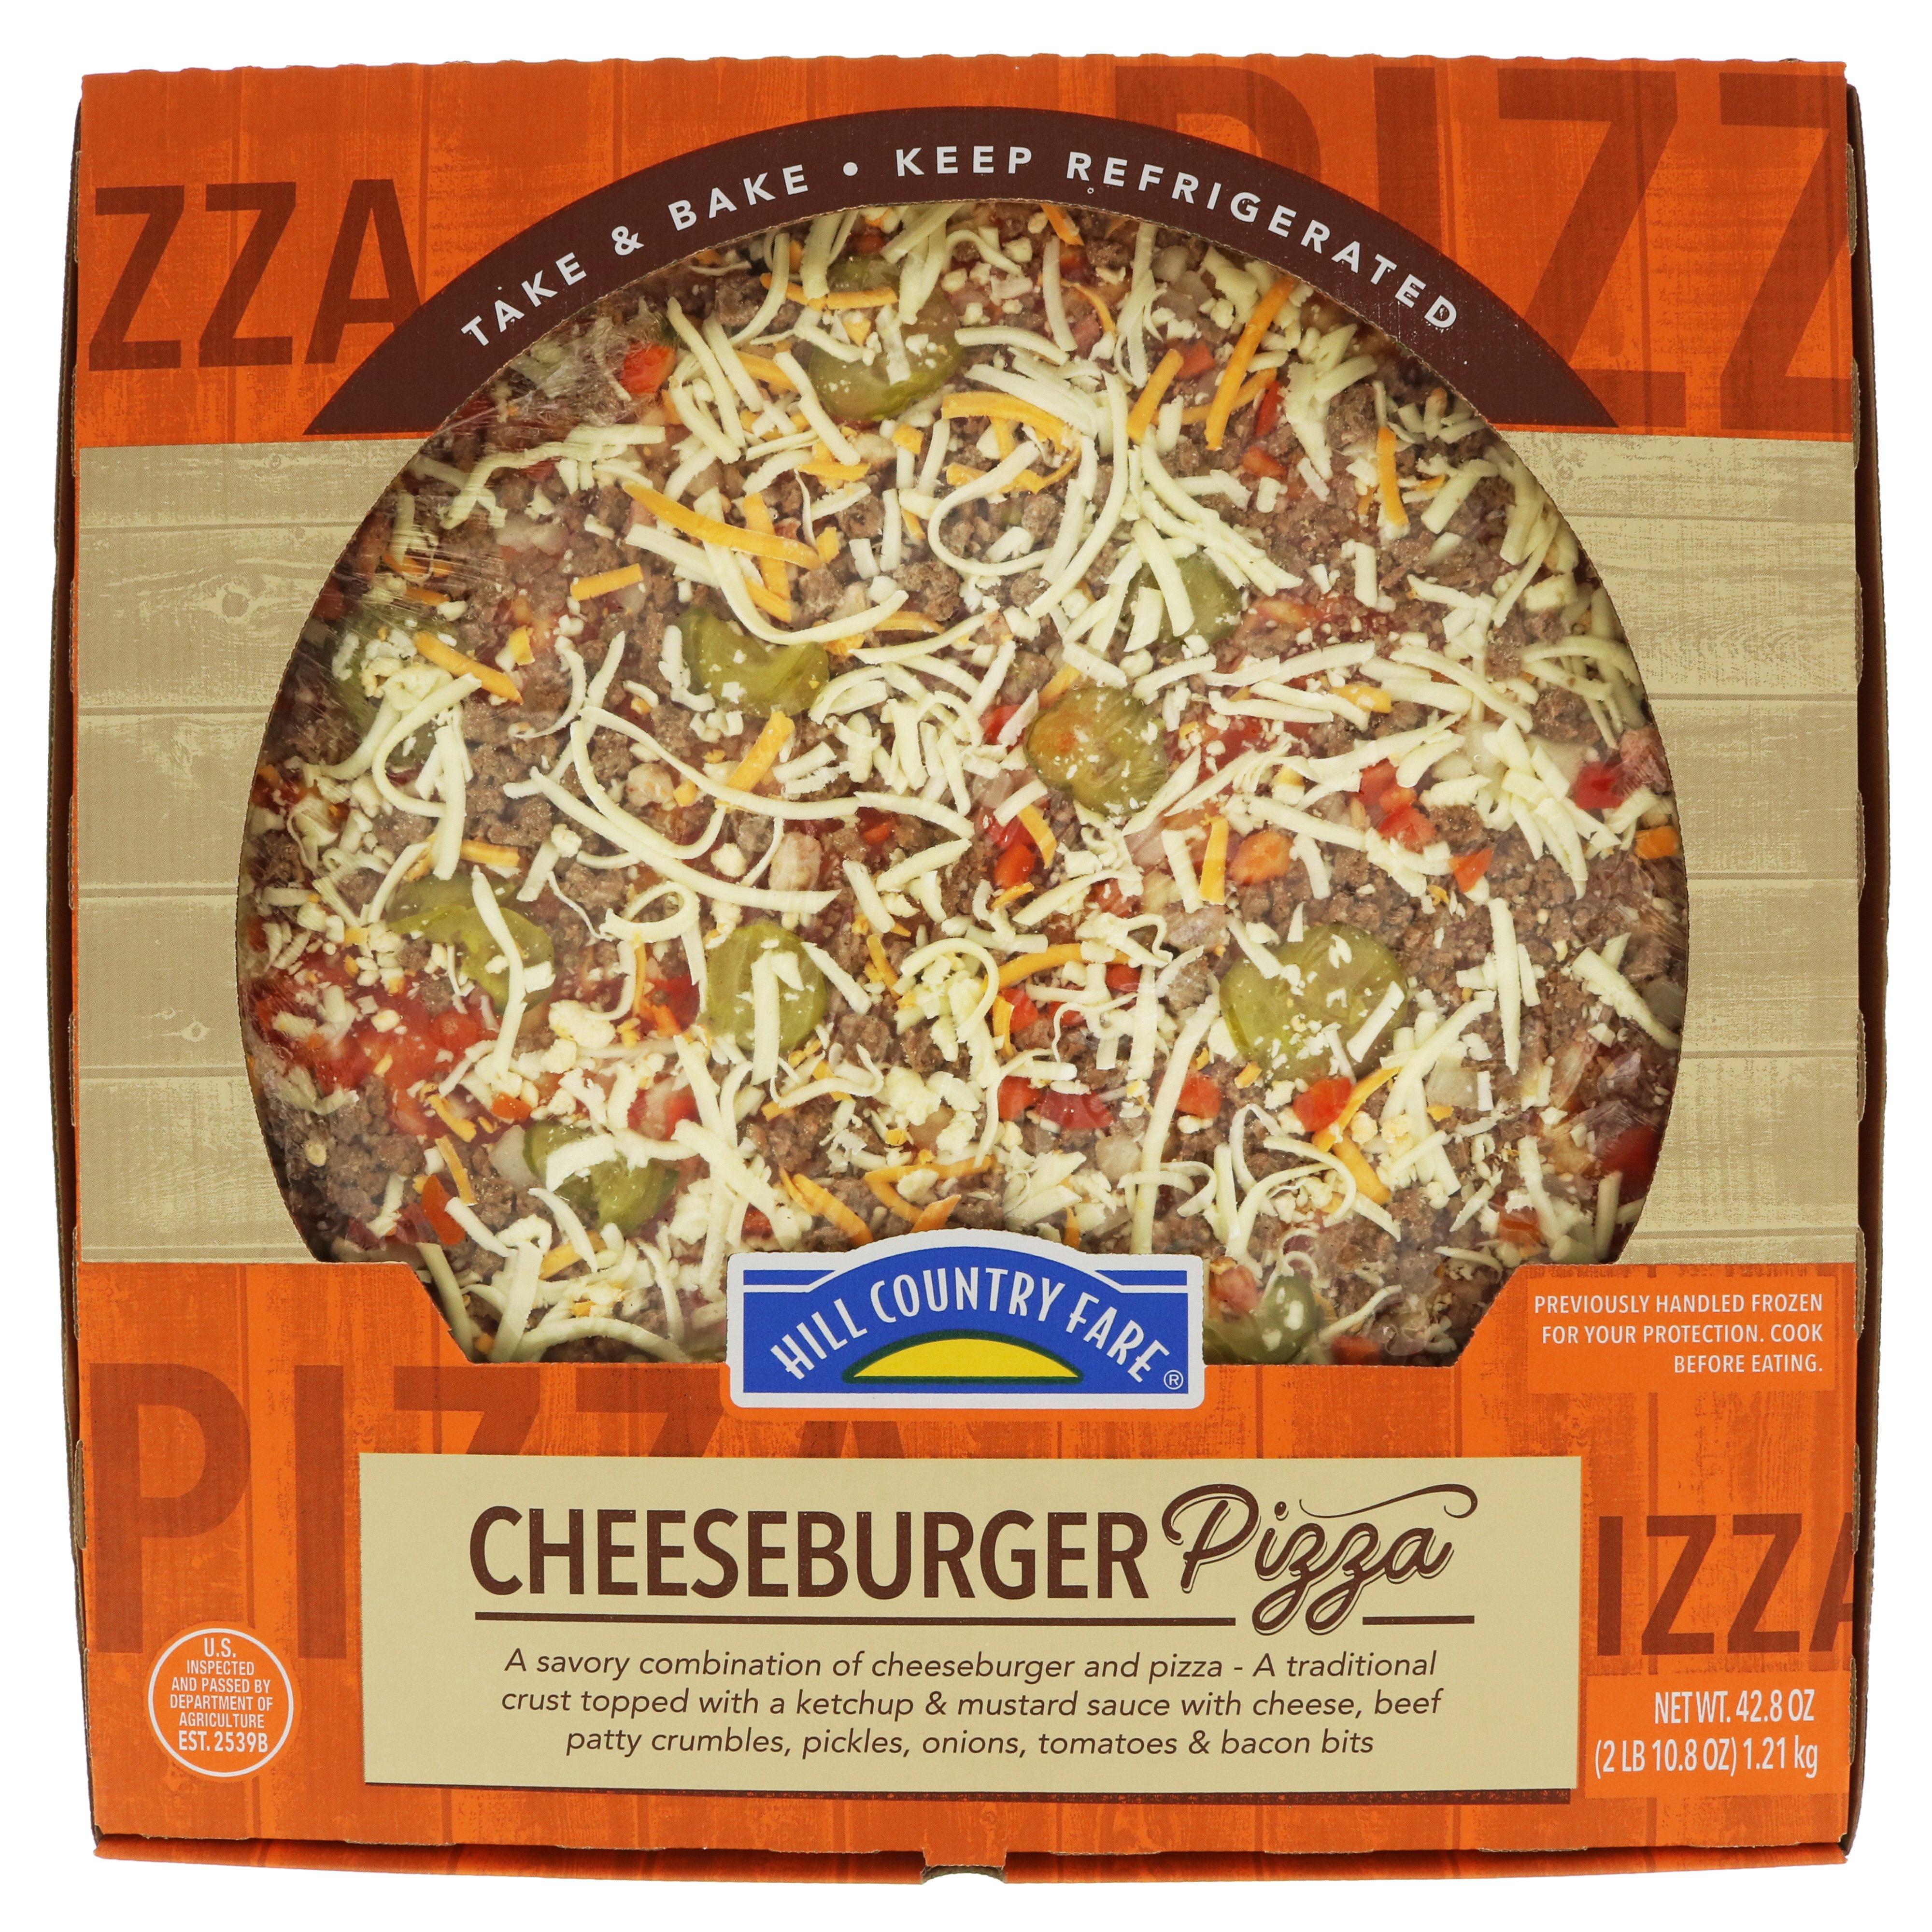 Hill Country Fare Cheeseburger Pizza